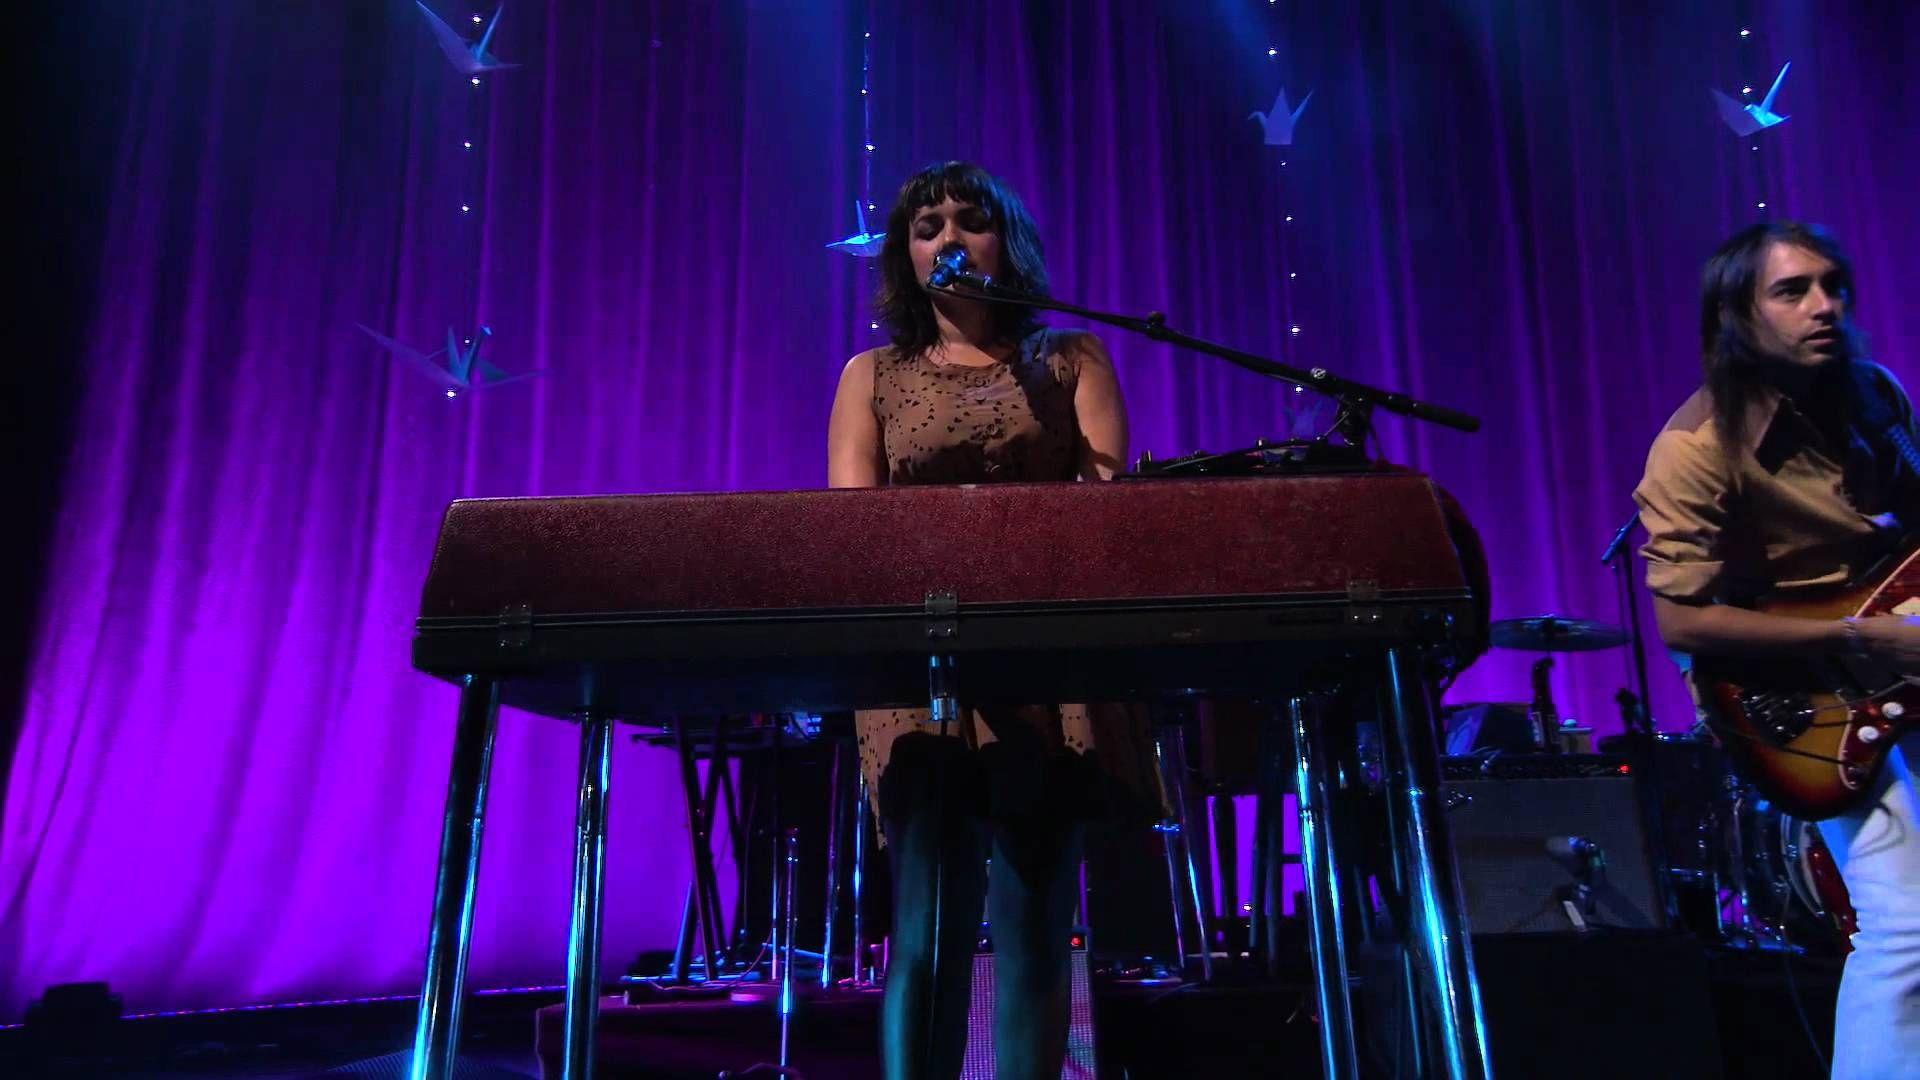 Say Goodbye - Norah Jones - iTunes Festival - 1080 HD { More dear Norah Jones much further below}